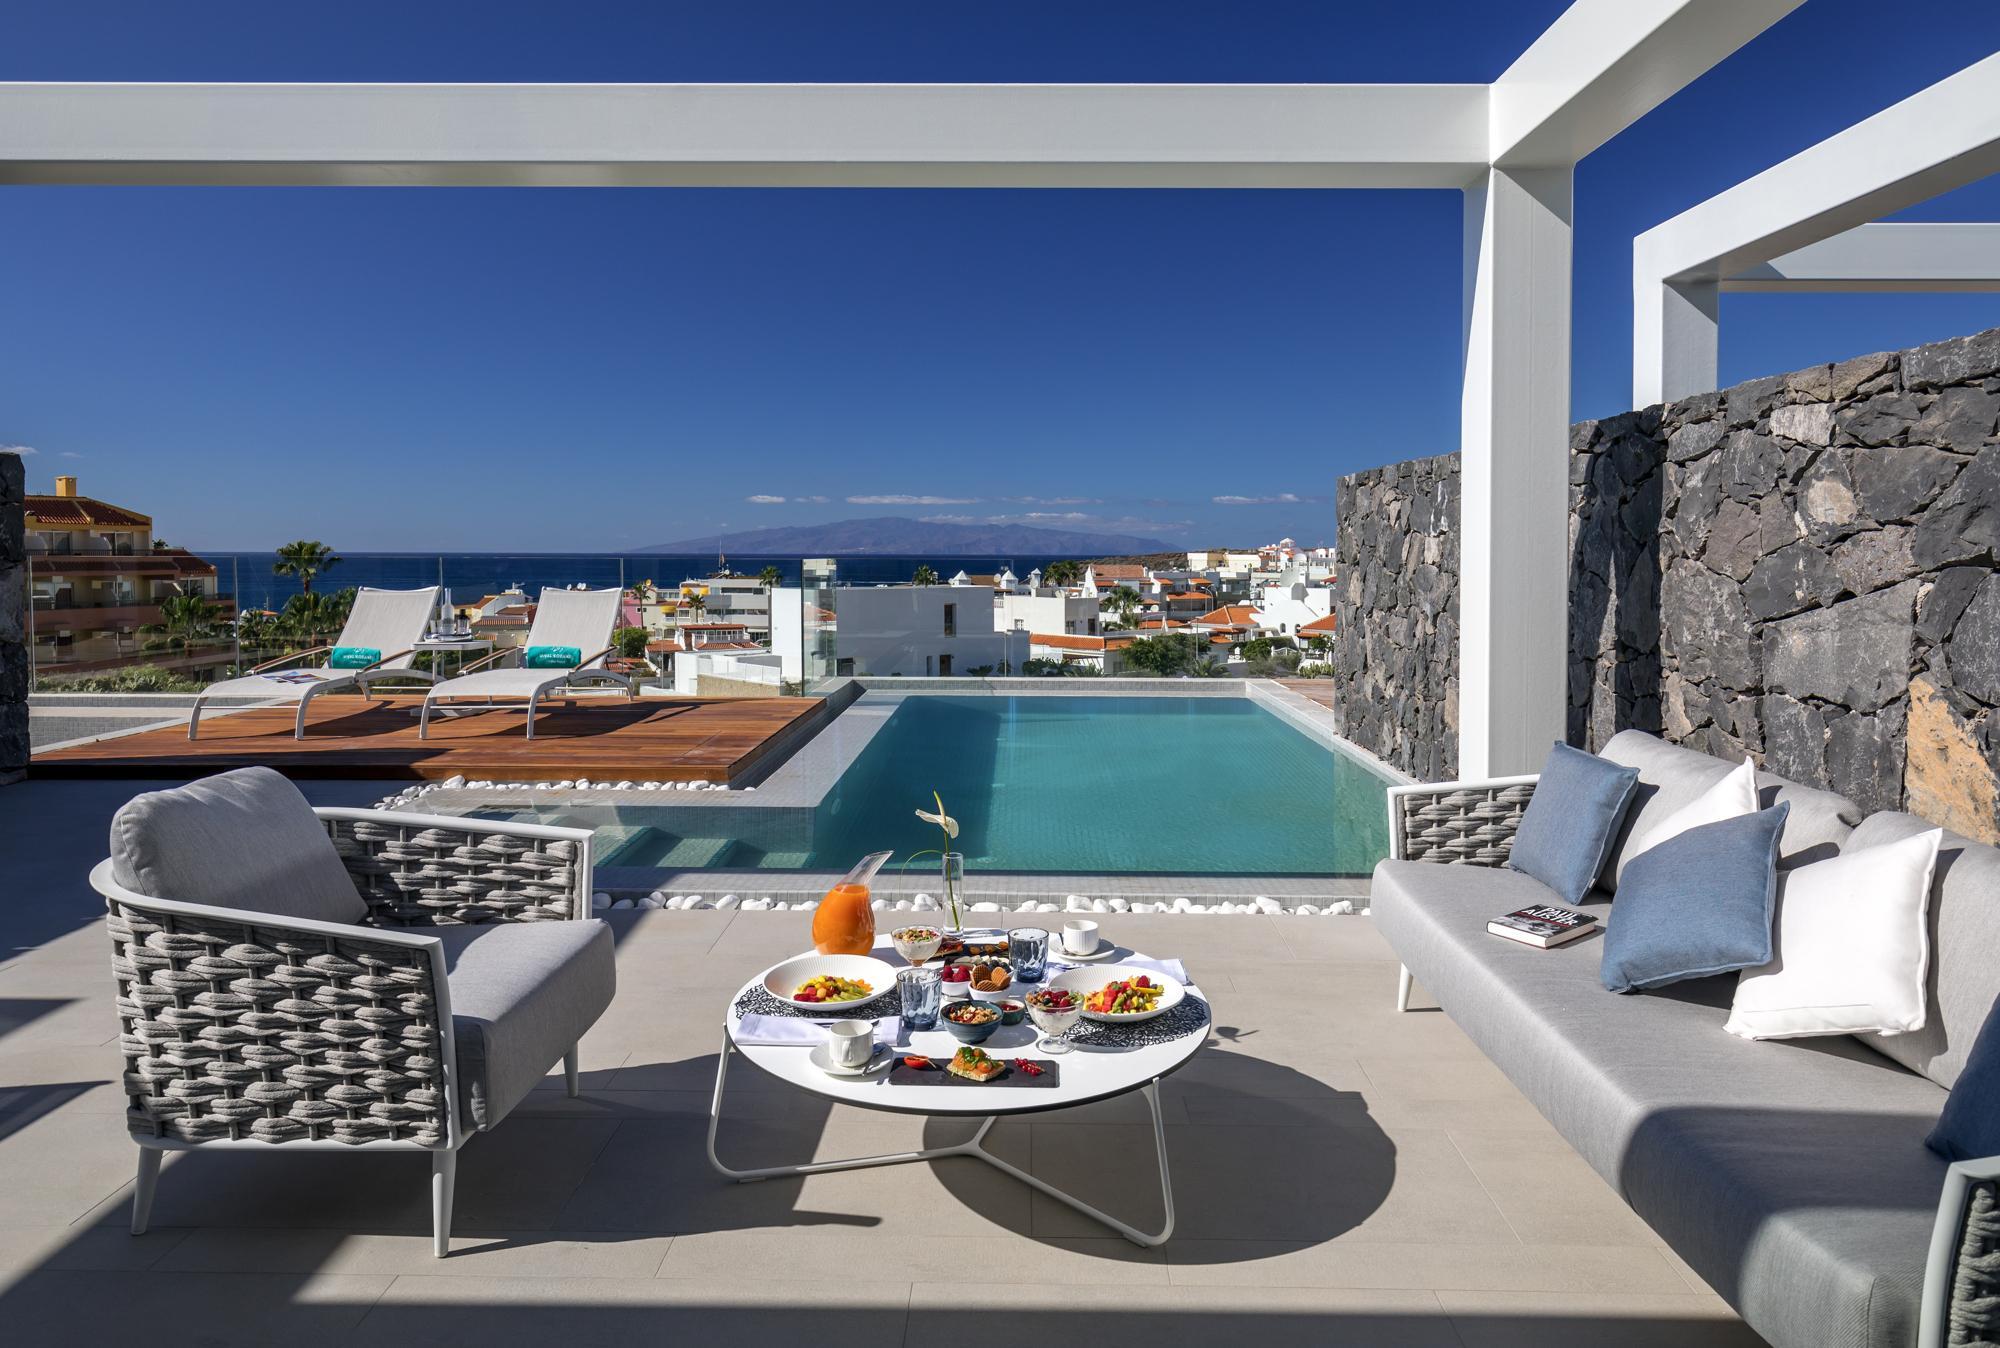 Terrace lounge set